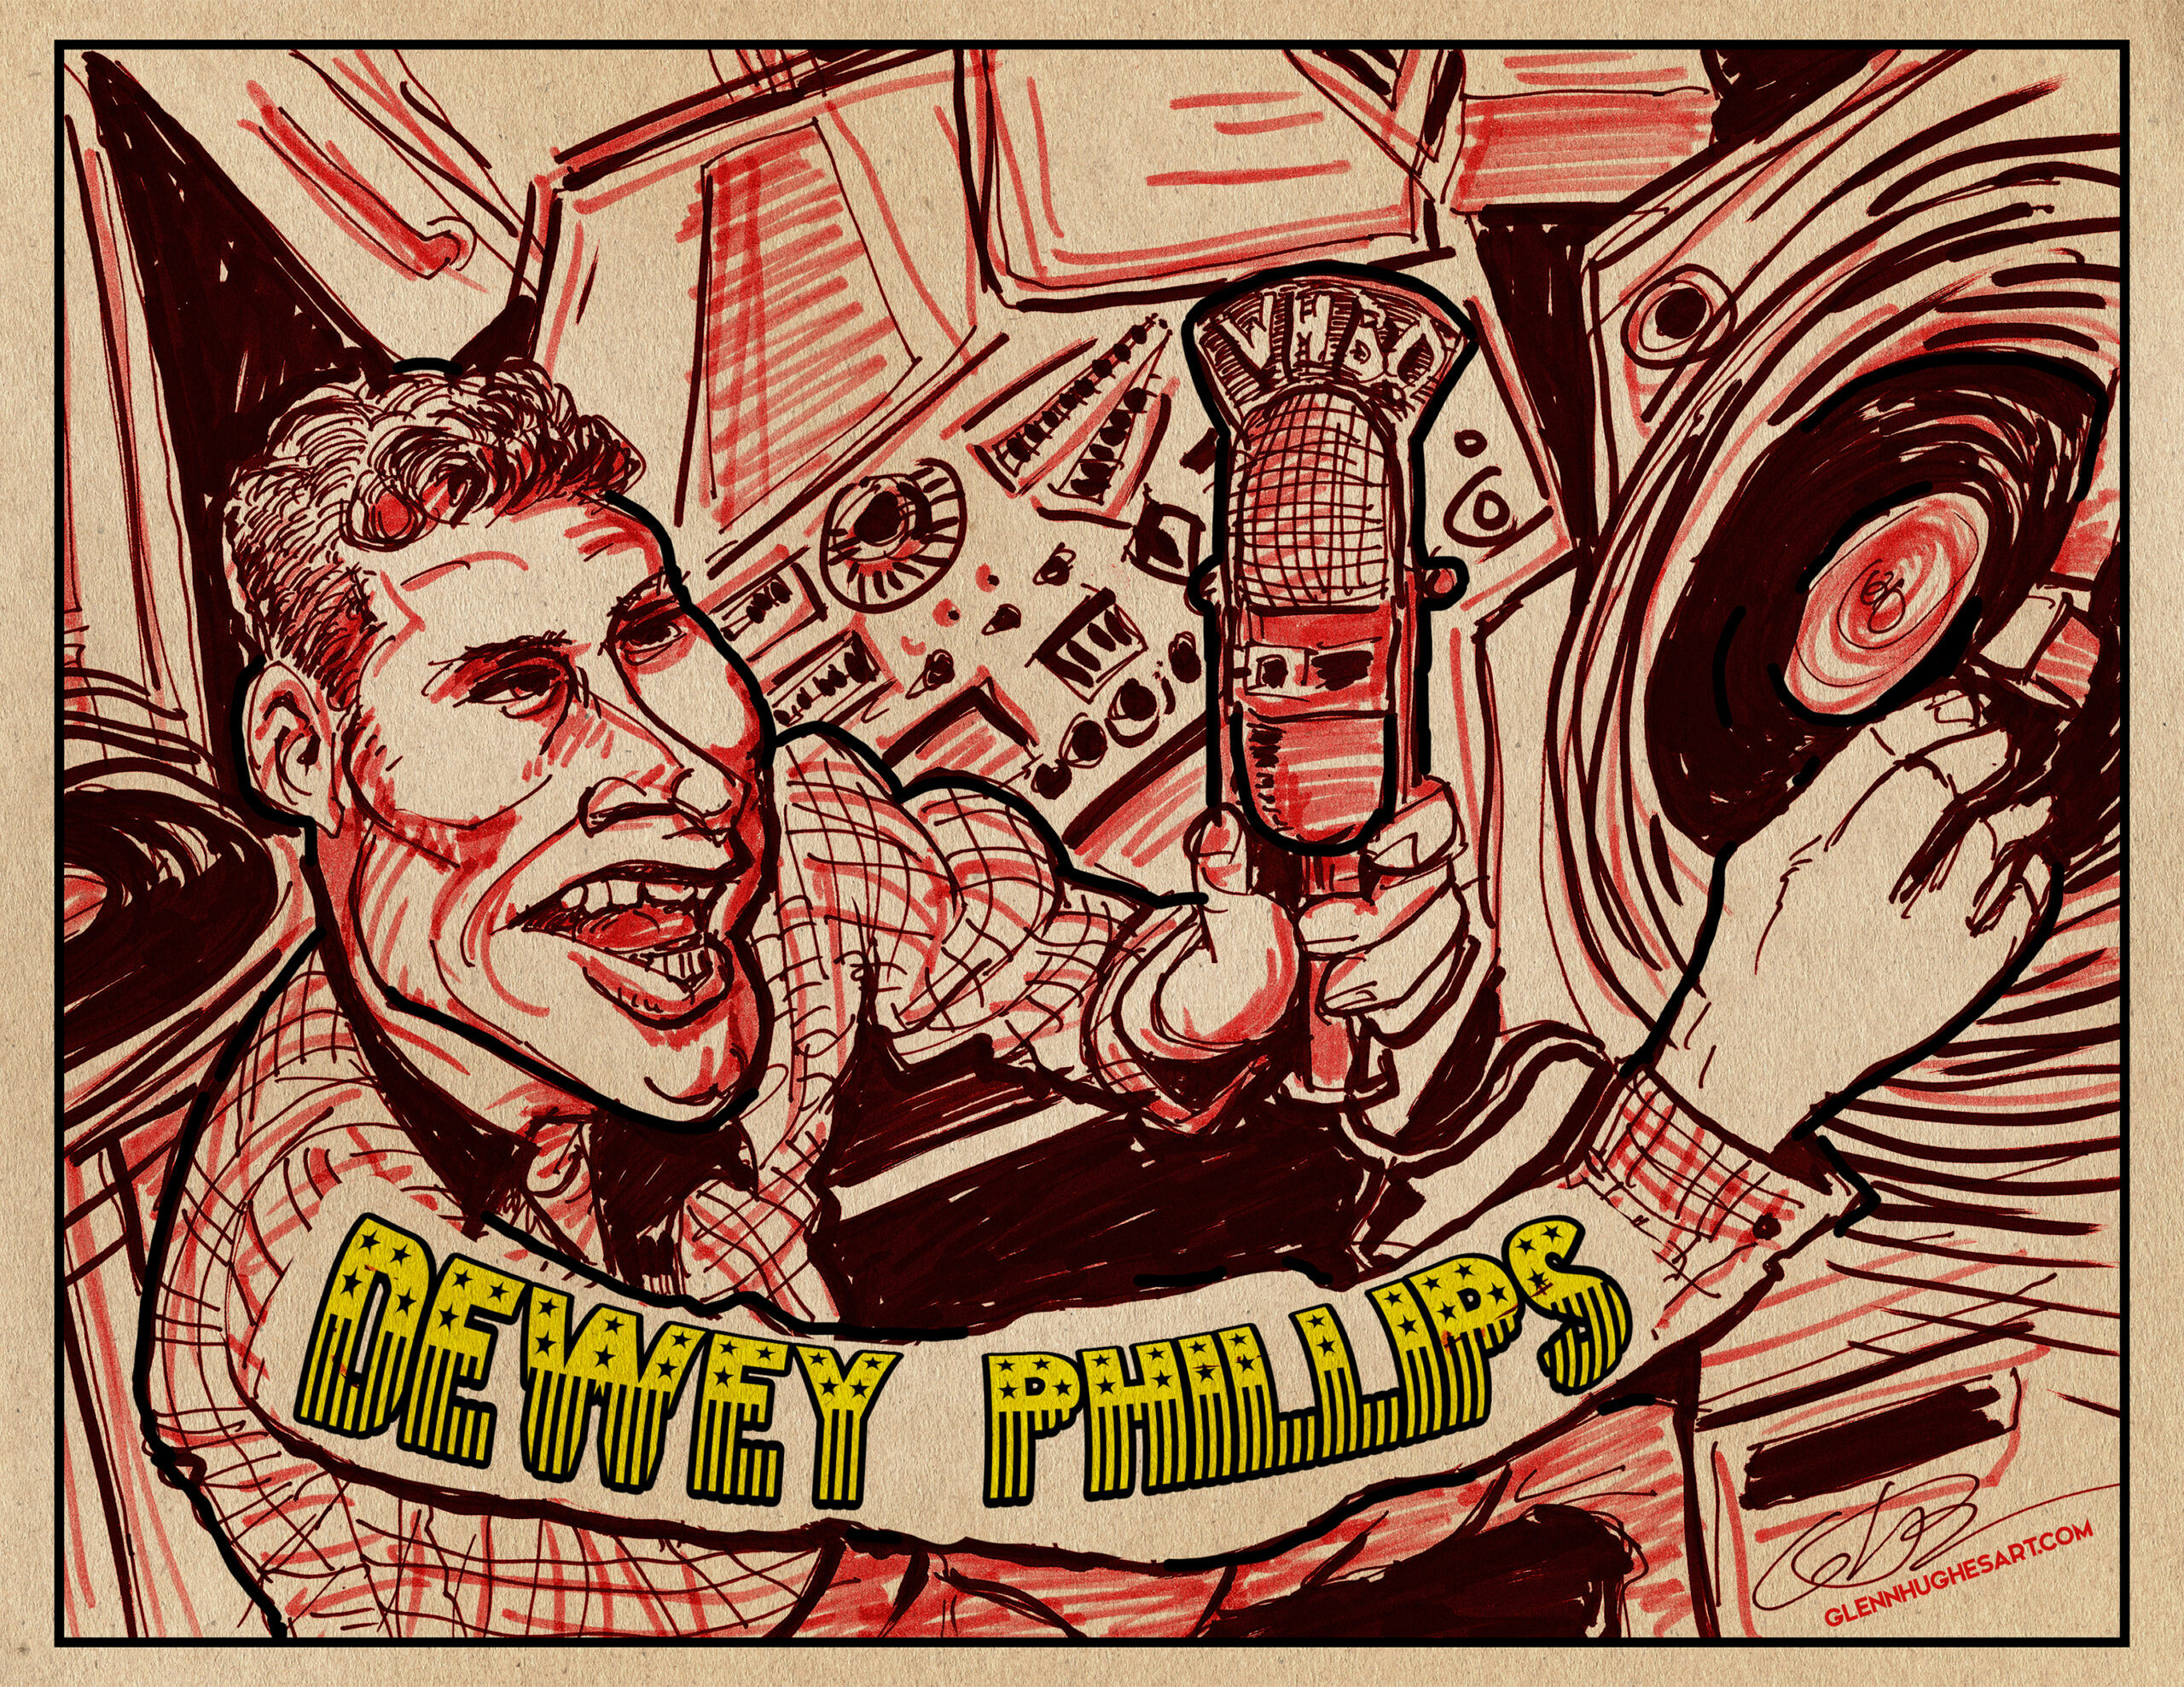 Dewey Phillips